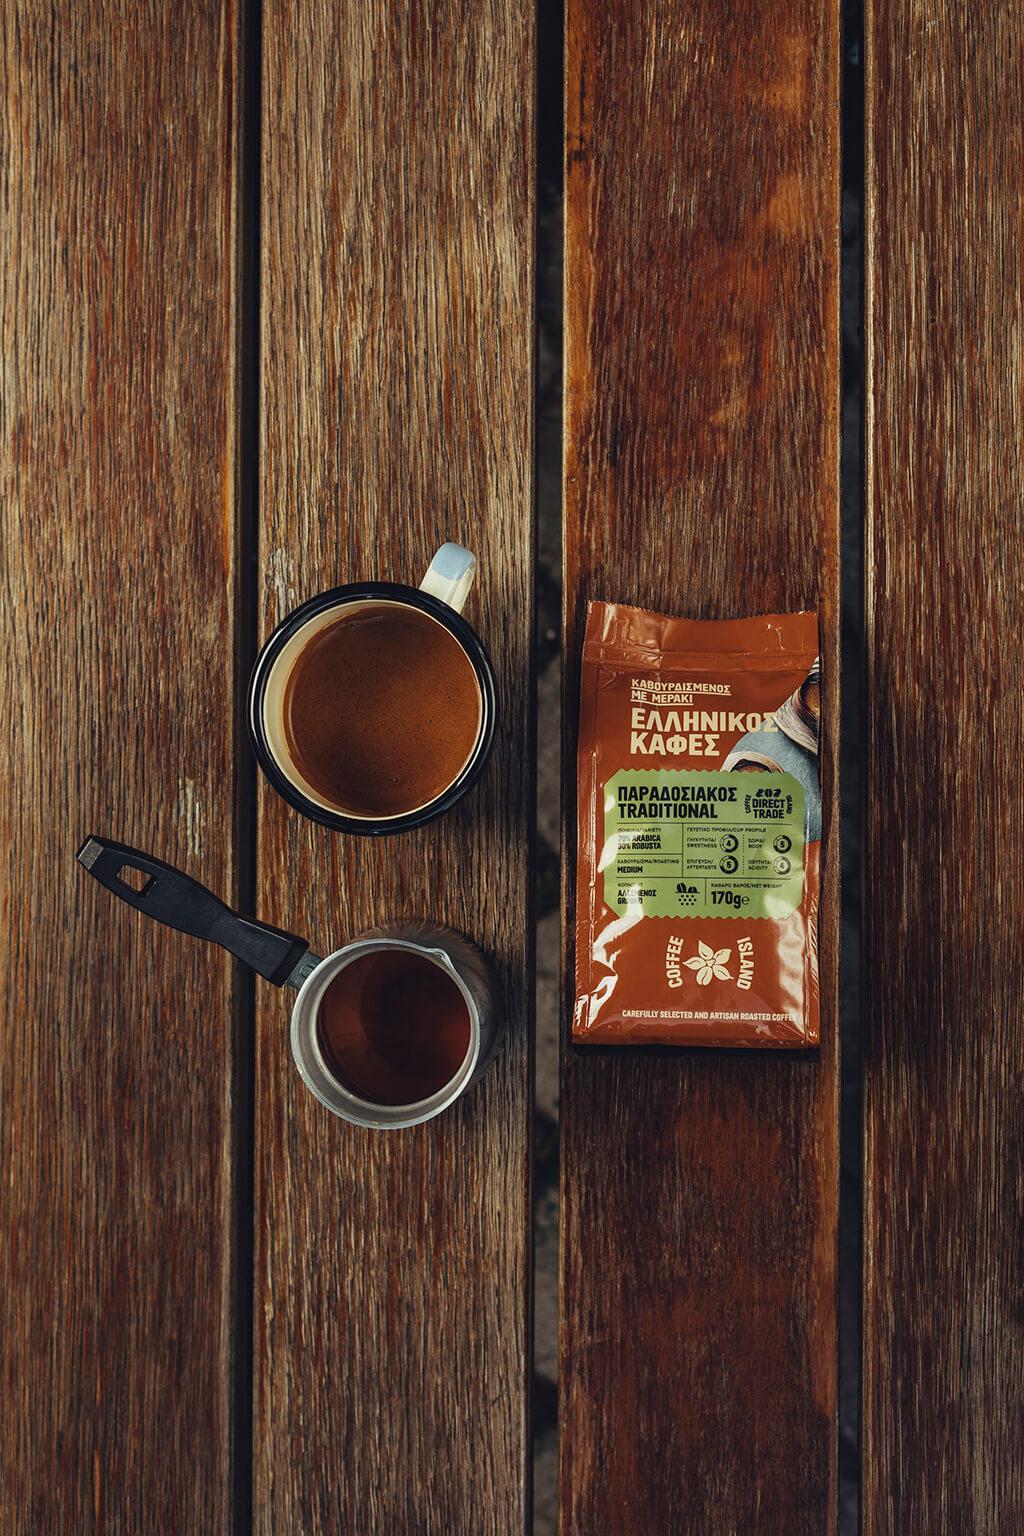 Coffee Island's traditional ibrik coffee